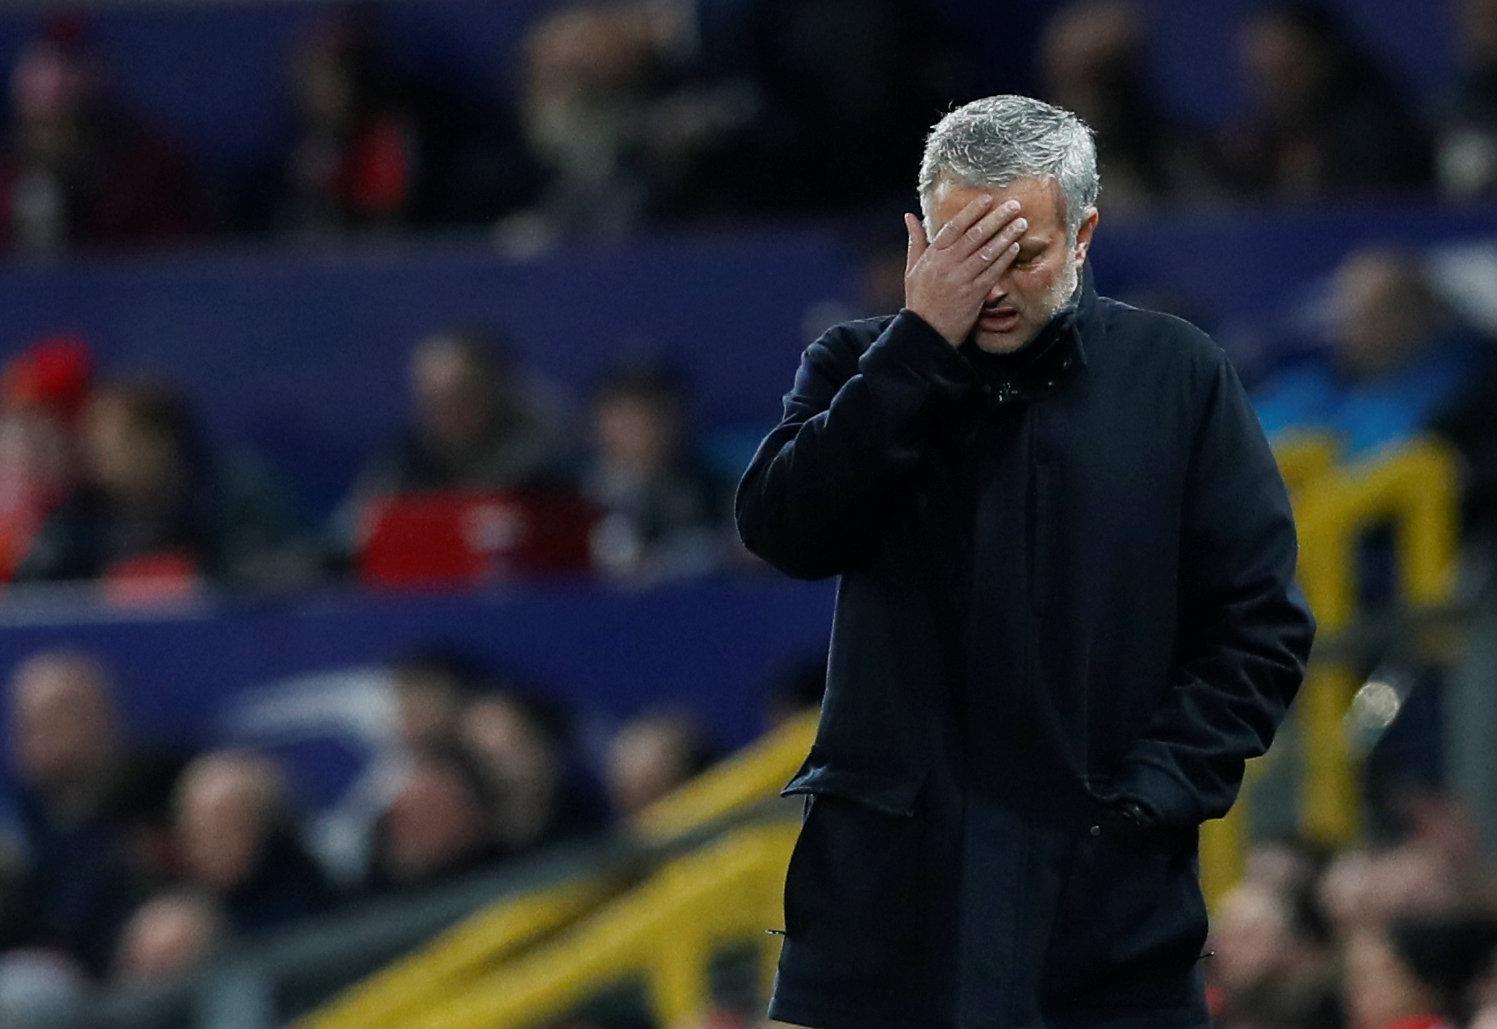 Nỗi thất vọng của HLV Mourinho sau khi M.U để thua Sevilla. Ảnh: REUTERS